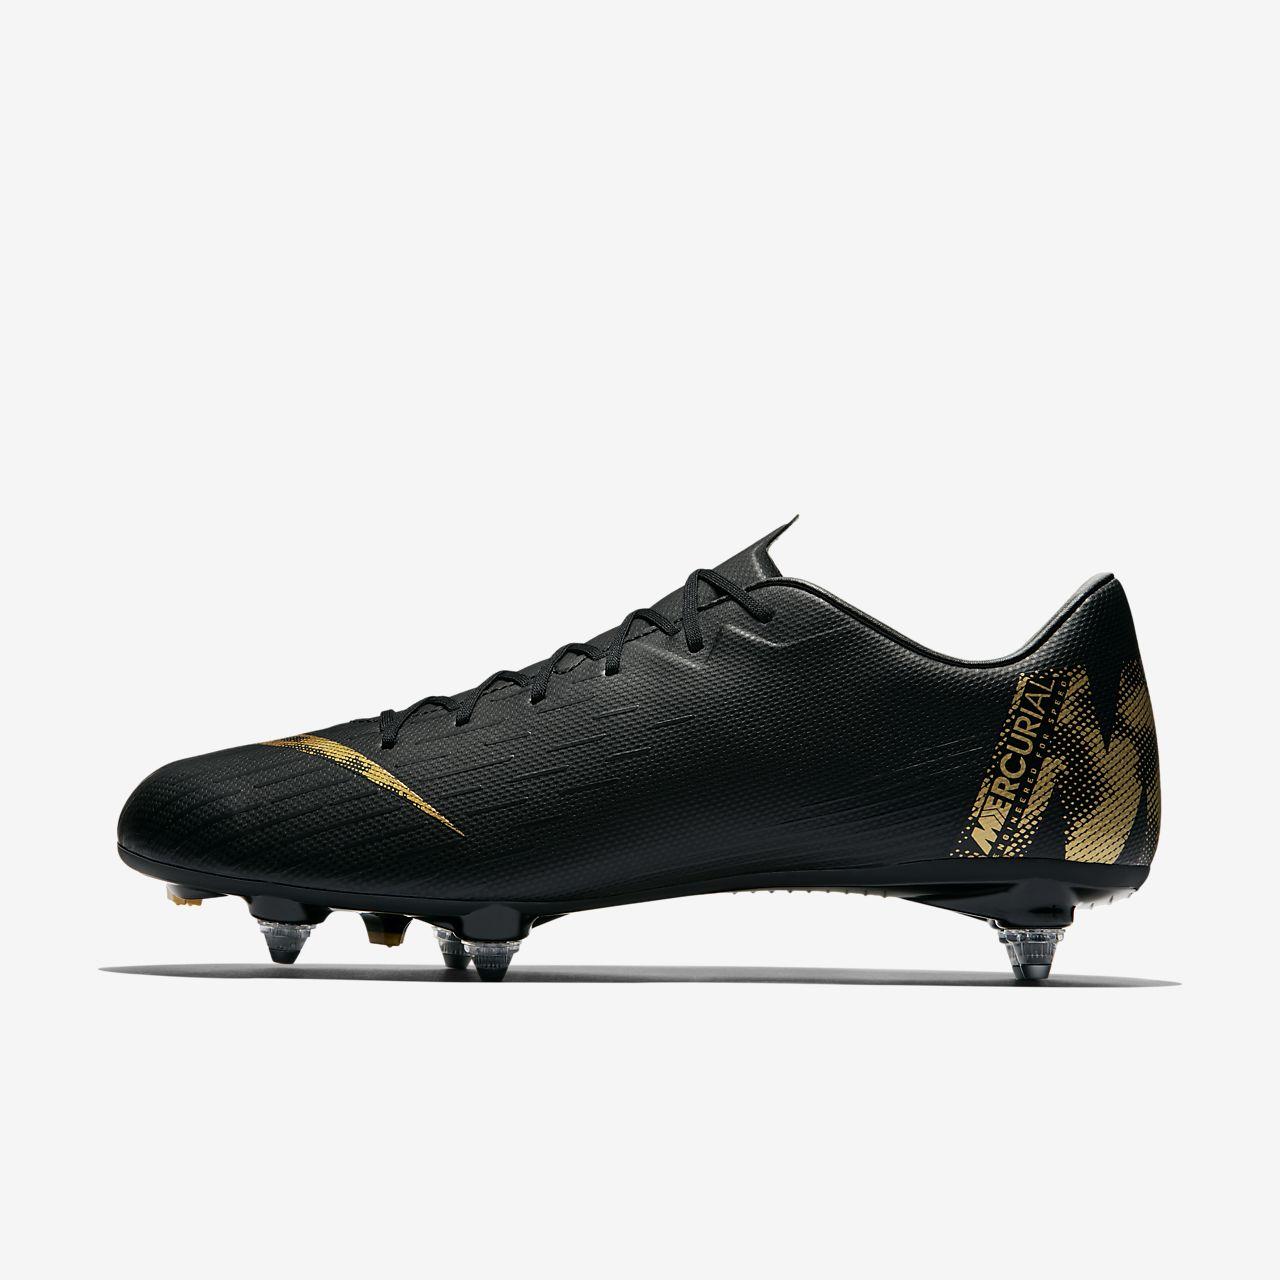 Chaussure de football à crampons pour terrain gras Nike Mercurial Vapor XII Academy SG-PRO